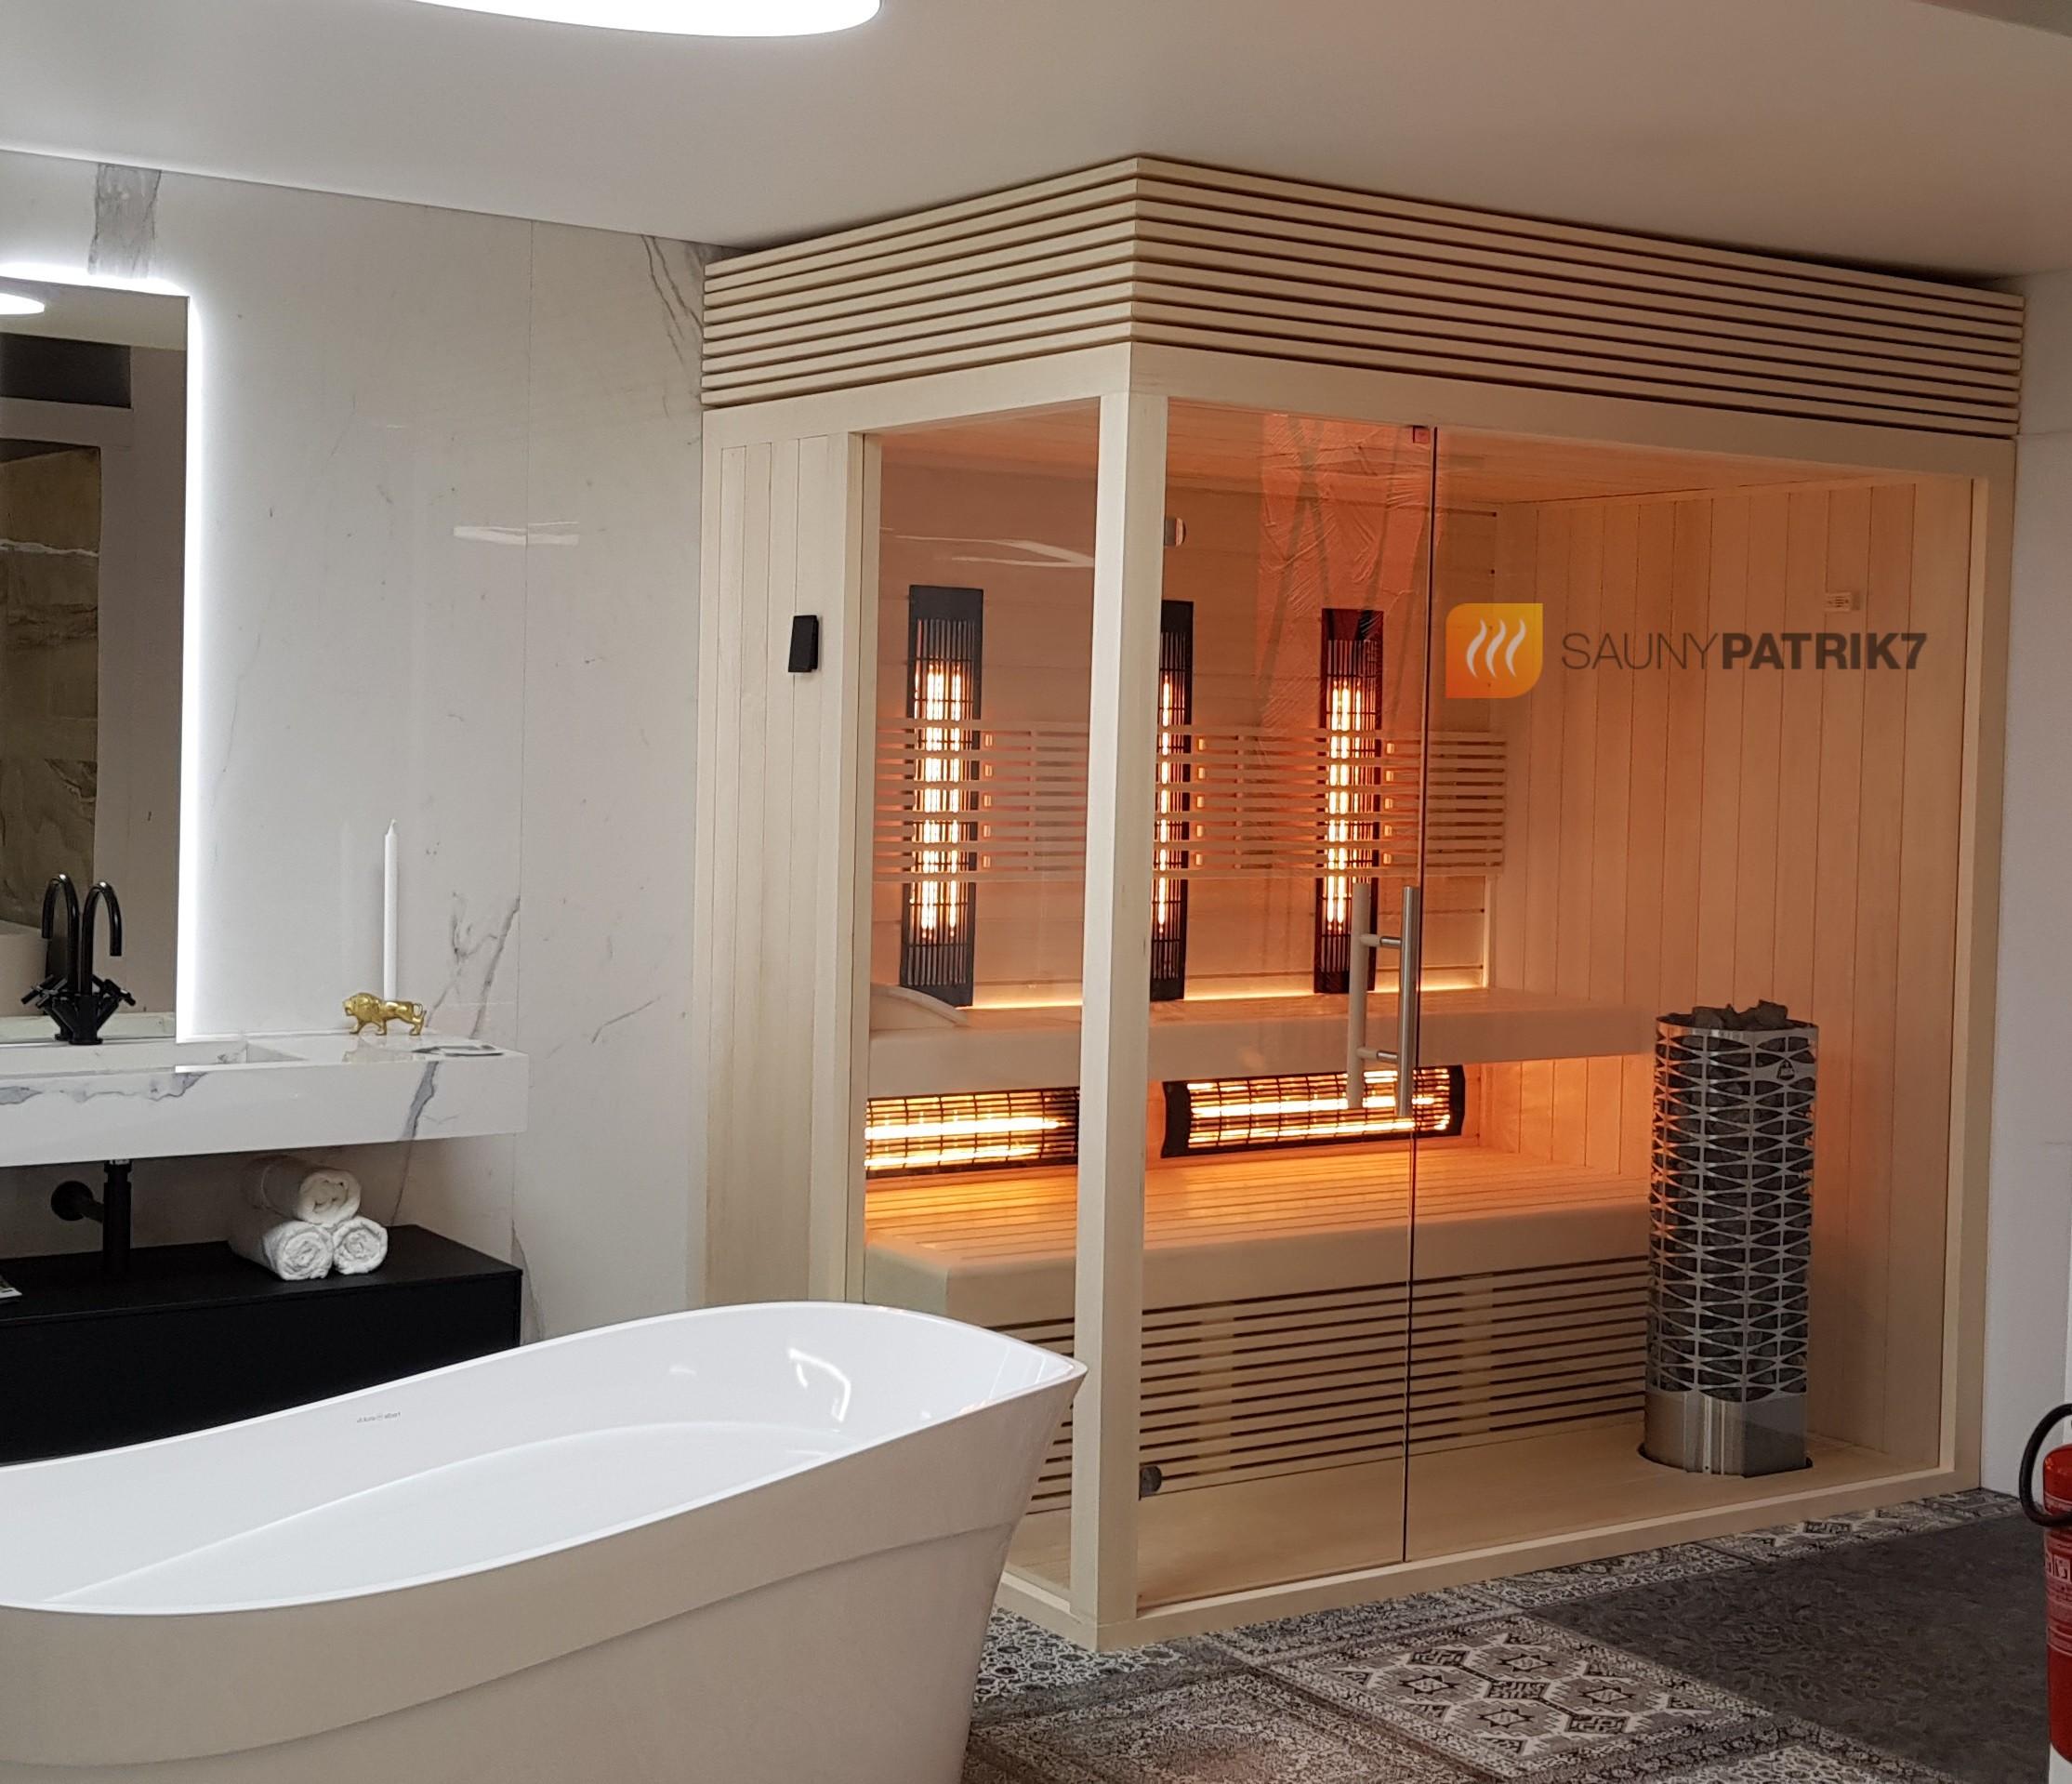 Biela osika - kombinovana sauna - sauny patrik 7